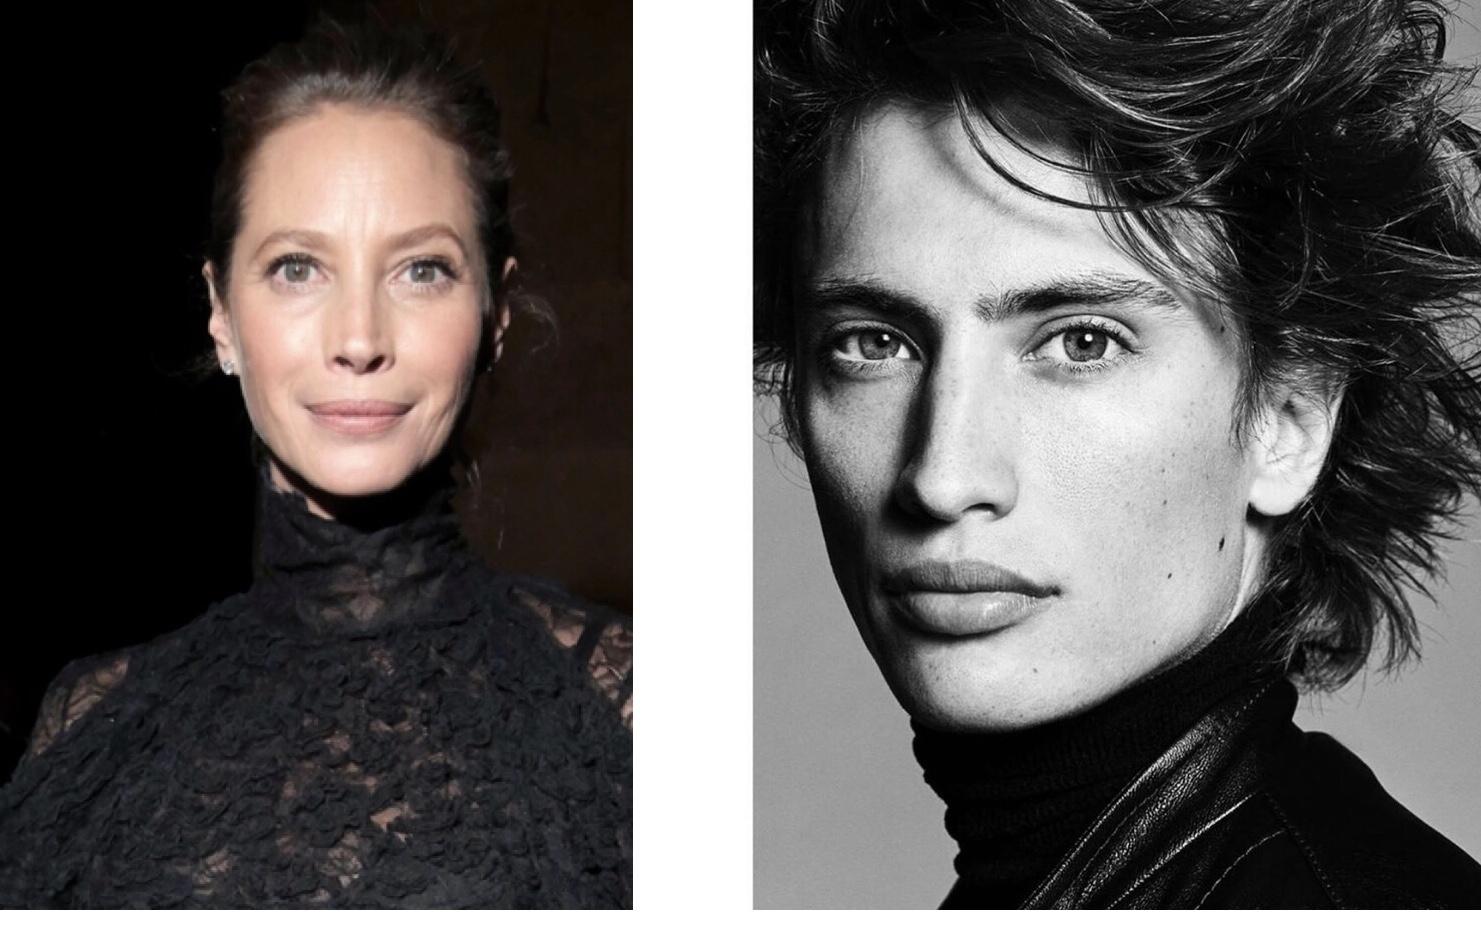 Christy Turlington Burns' Doppelgänger Nephew Joins IMG Models